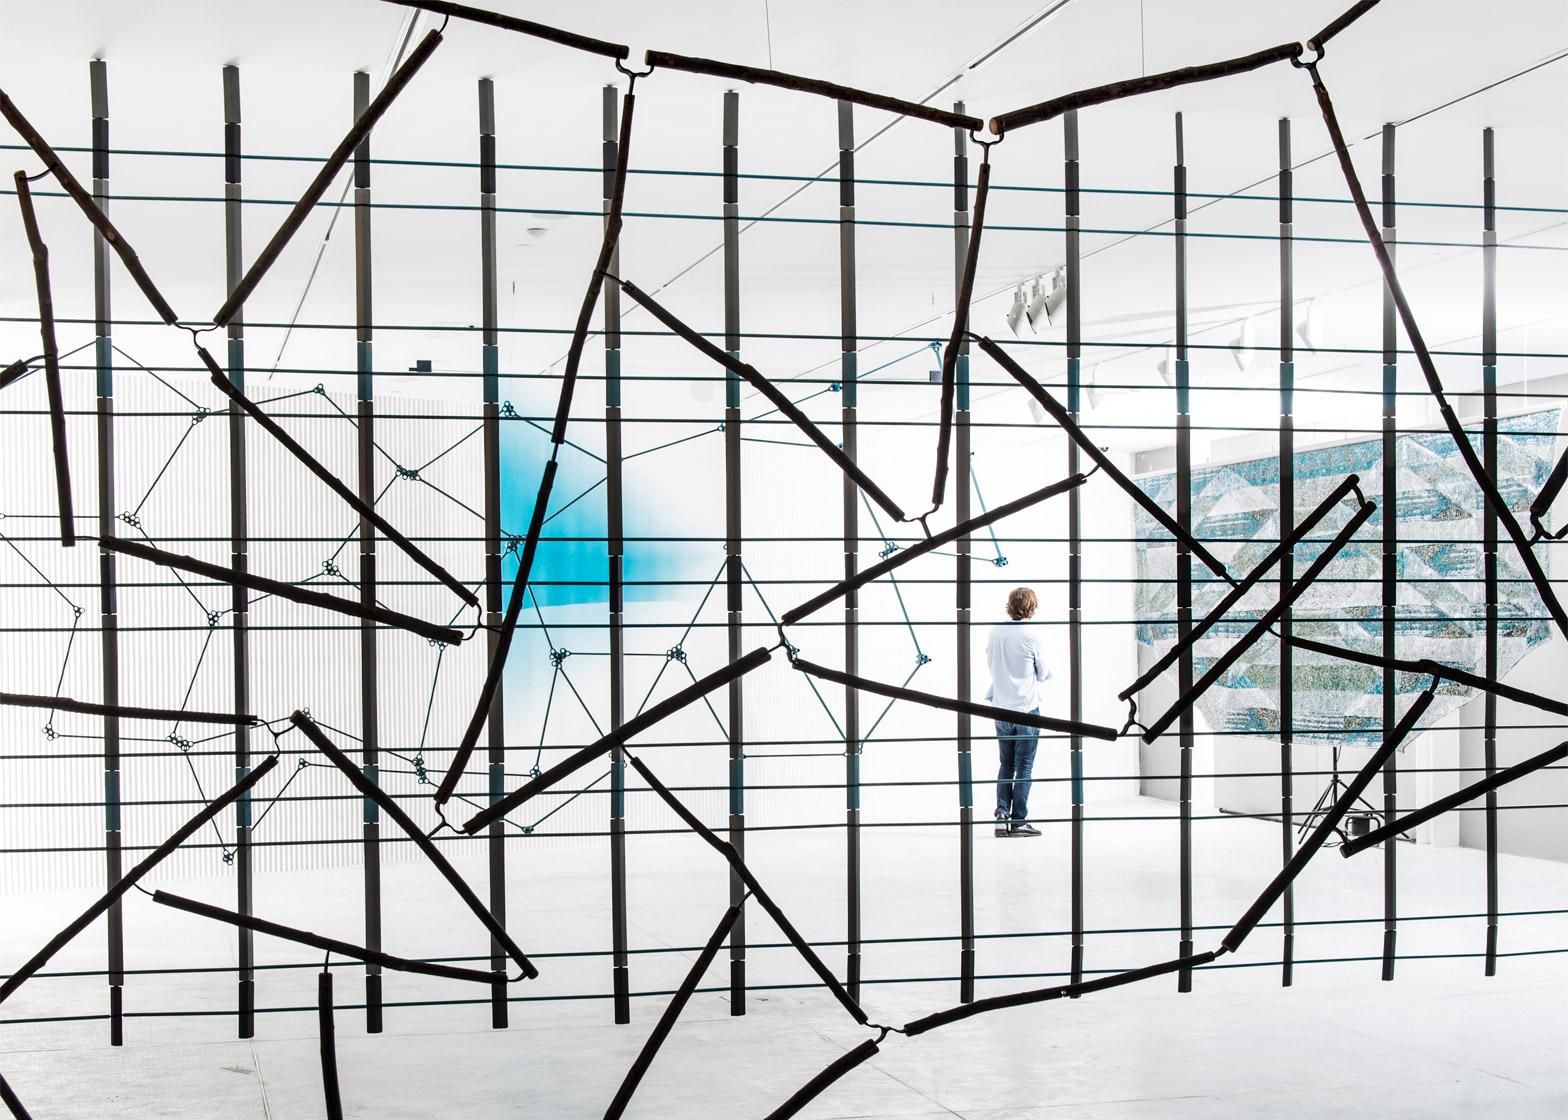 17 Screens by Ronan and Erwan Bouroullec